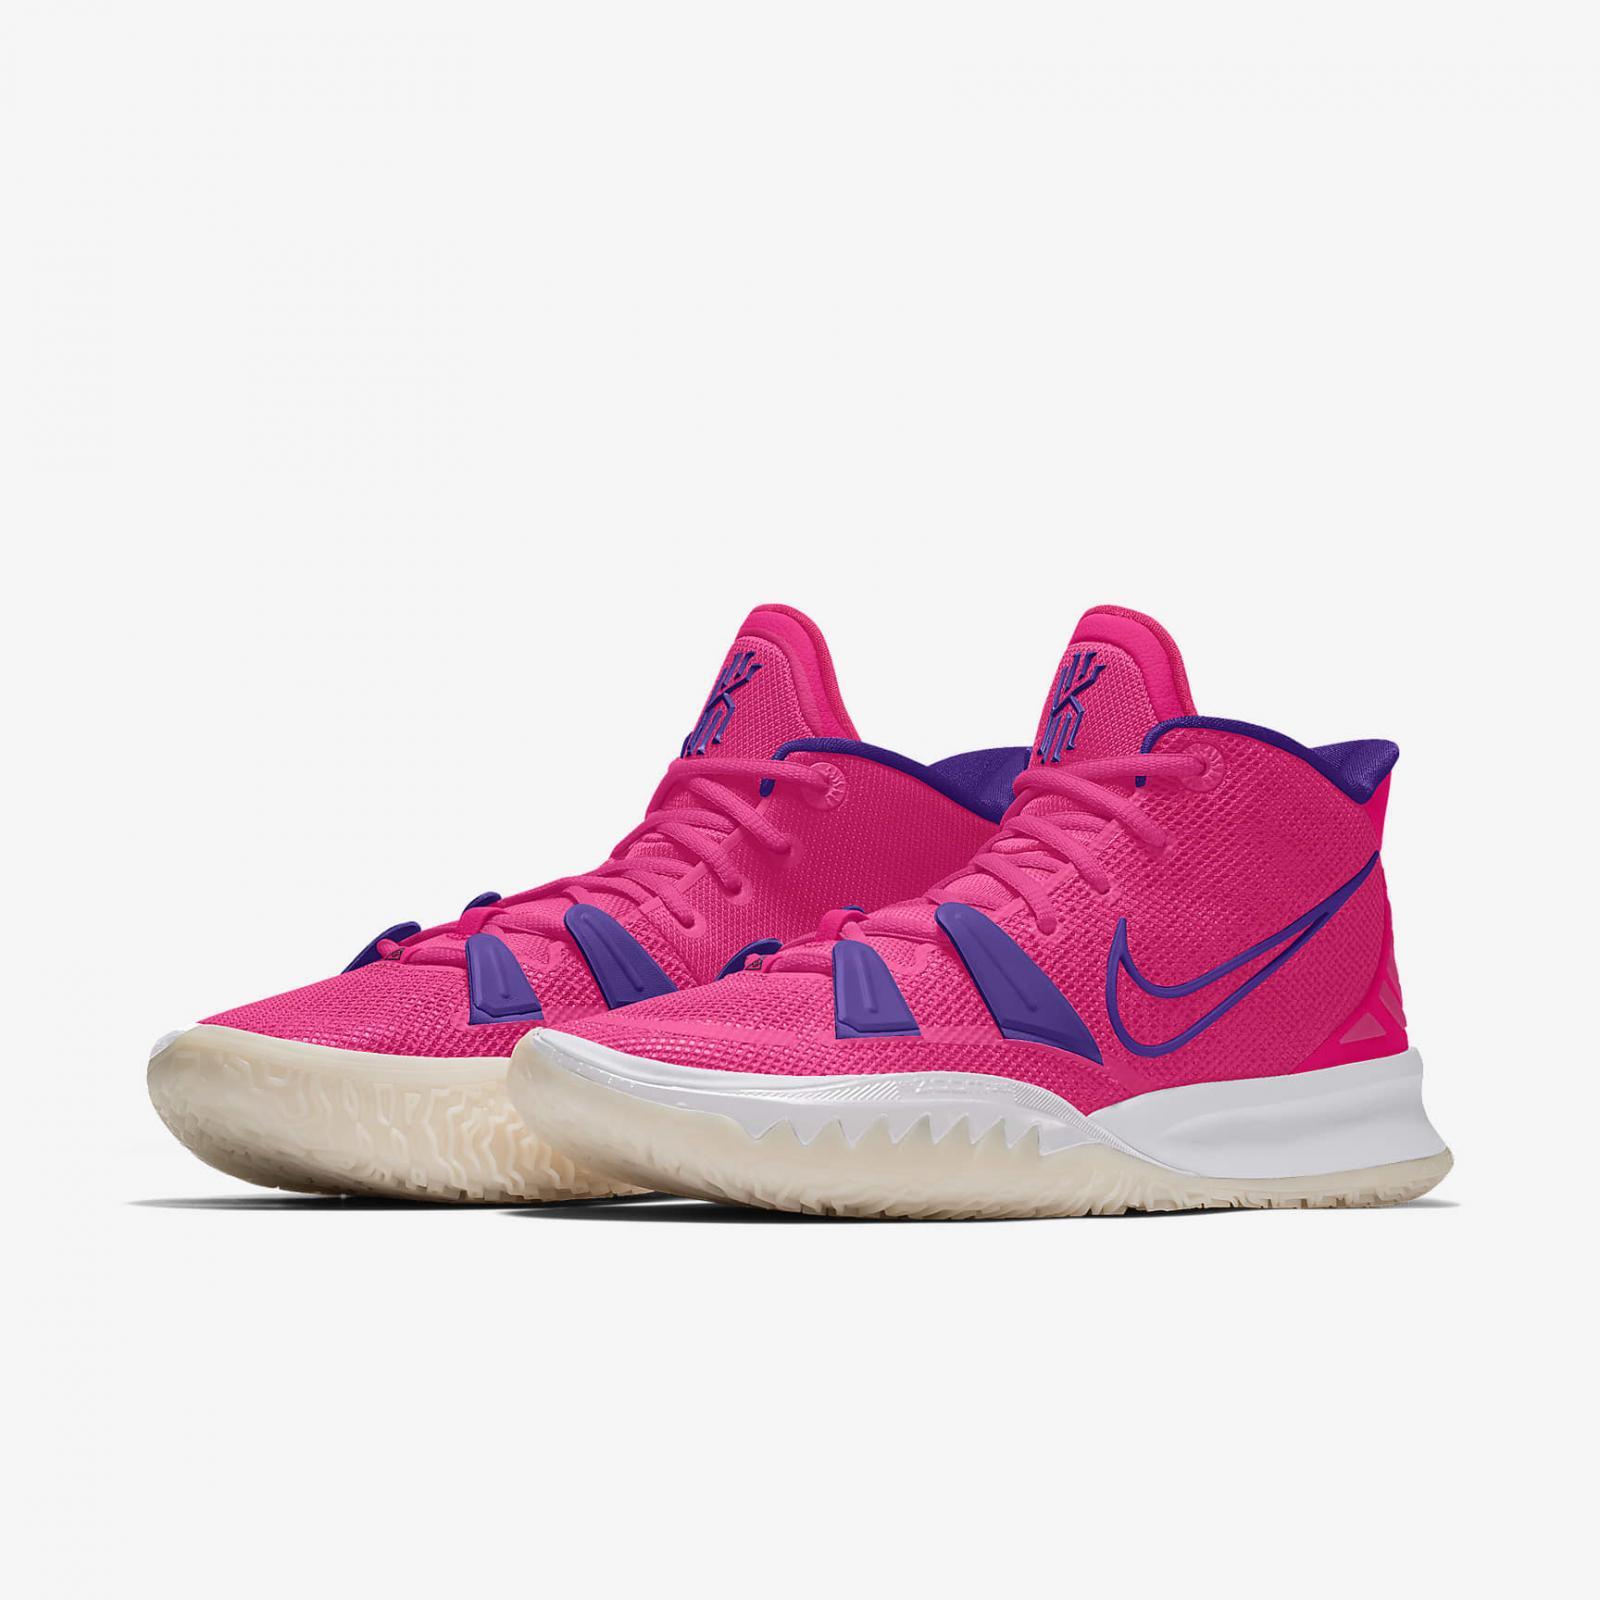 KYRIE 7即将上线Nike By You定制平台